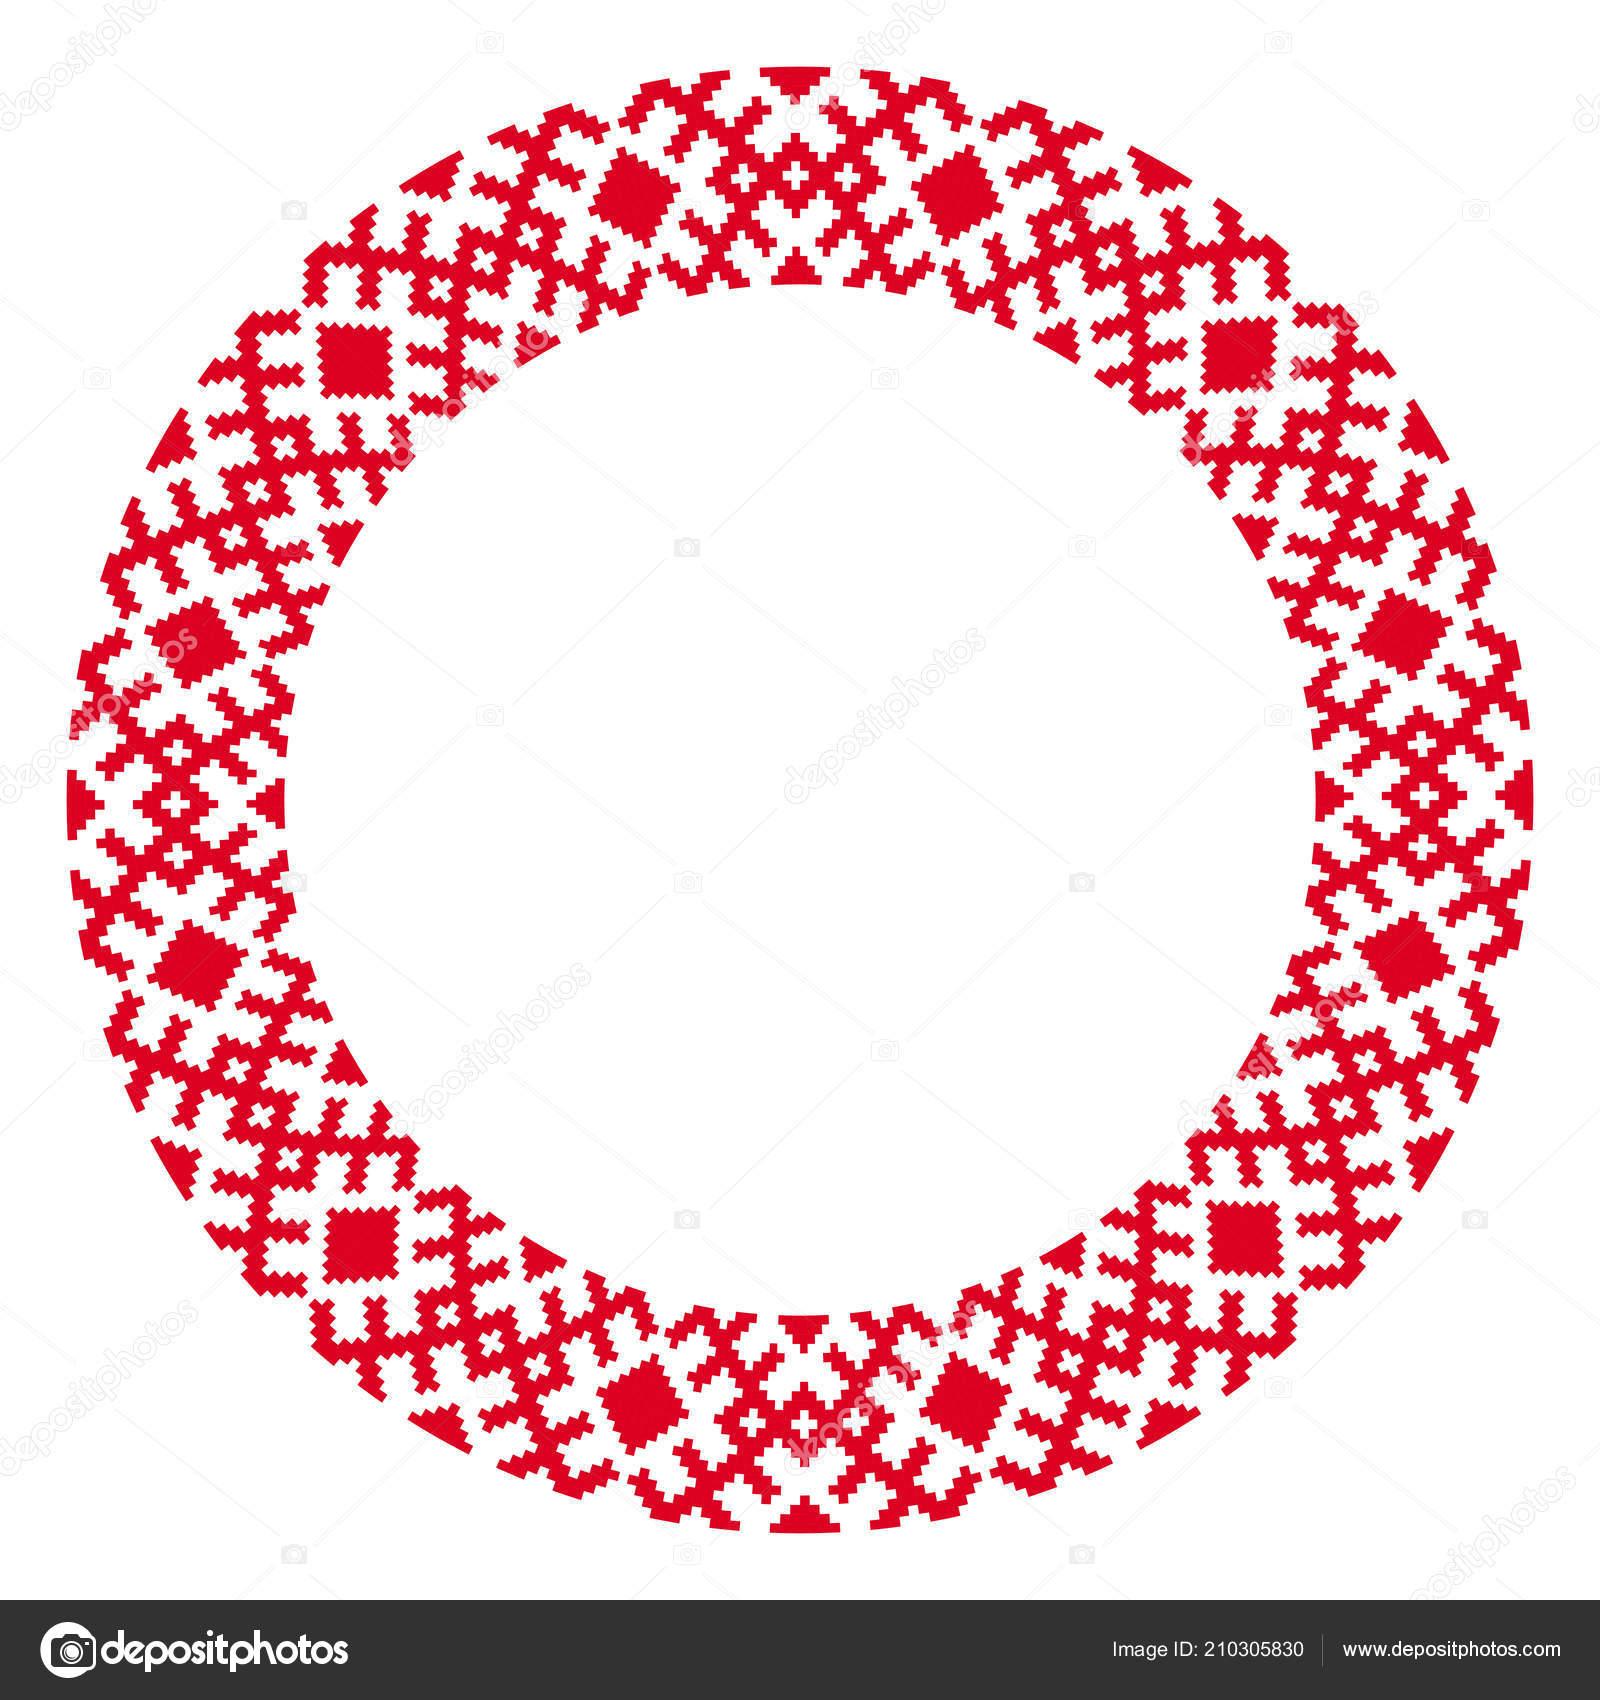 Bordado Tradicional Redondo Ilustración Vector Patrón Bordado ...